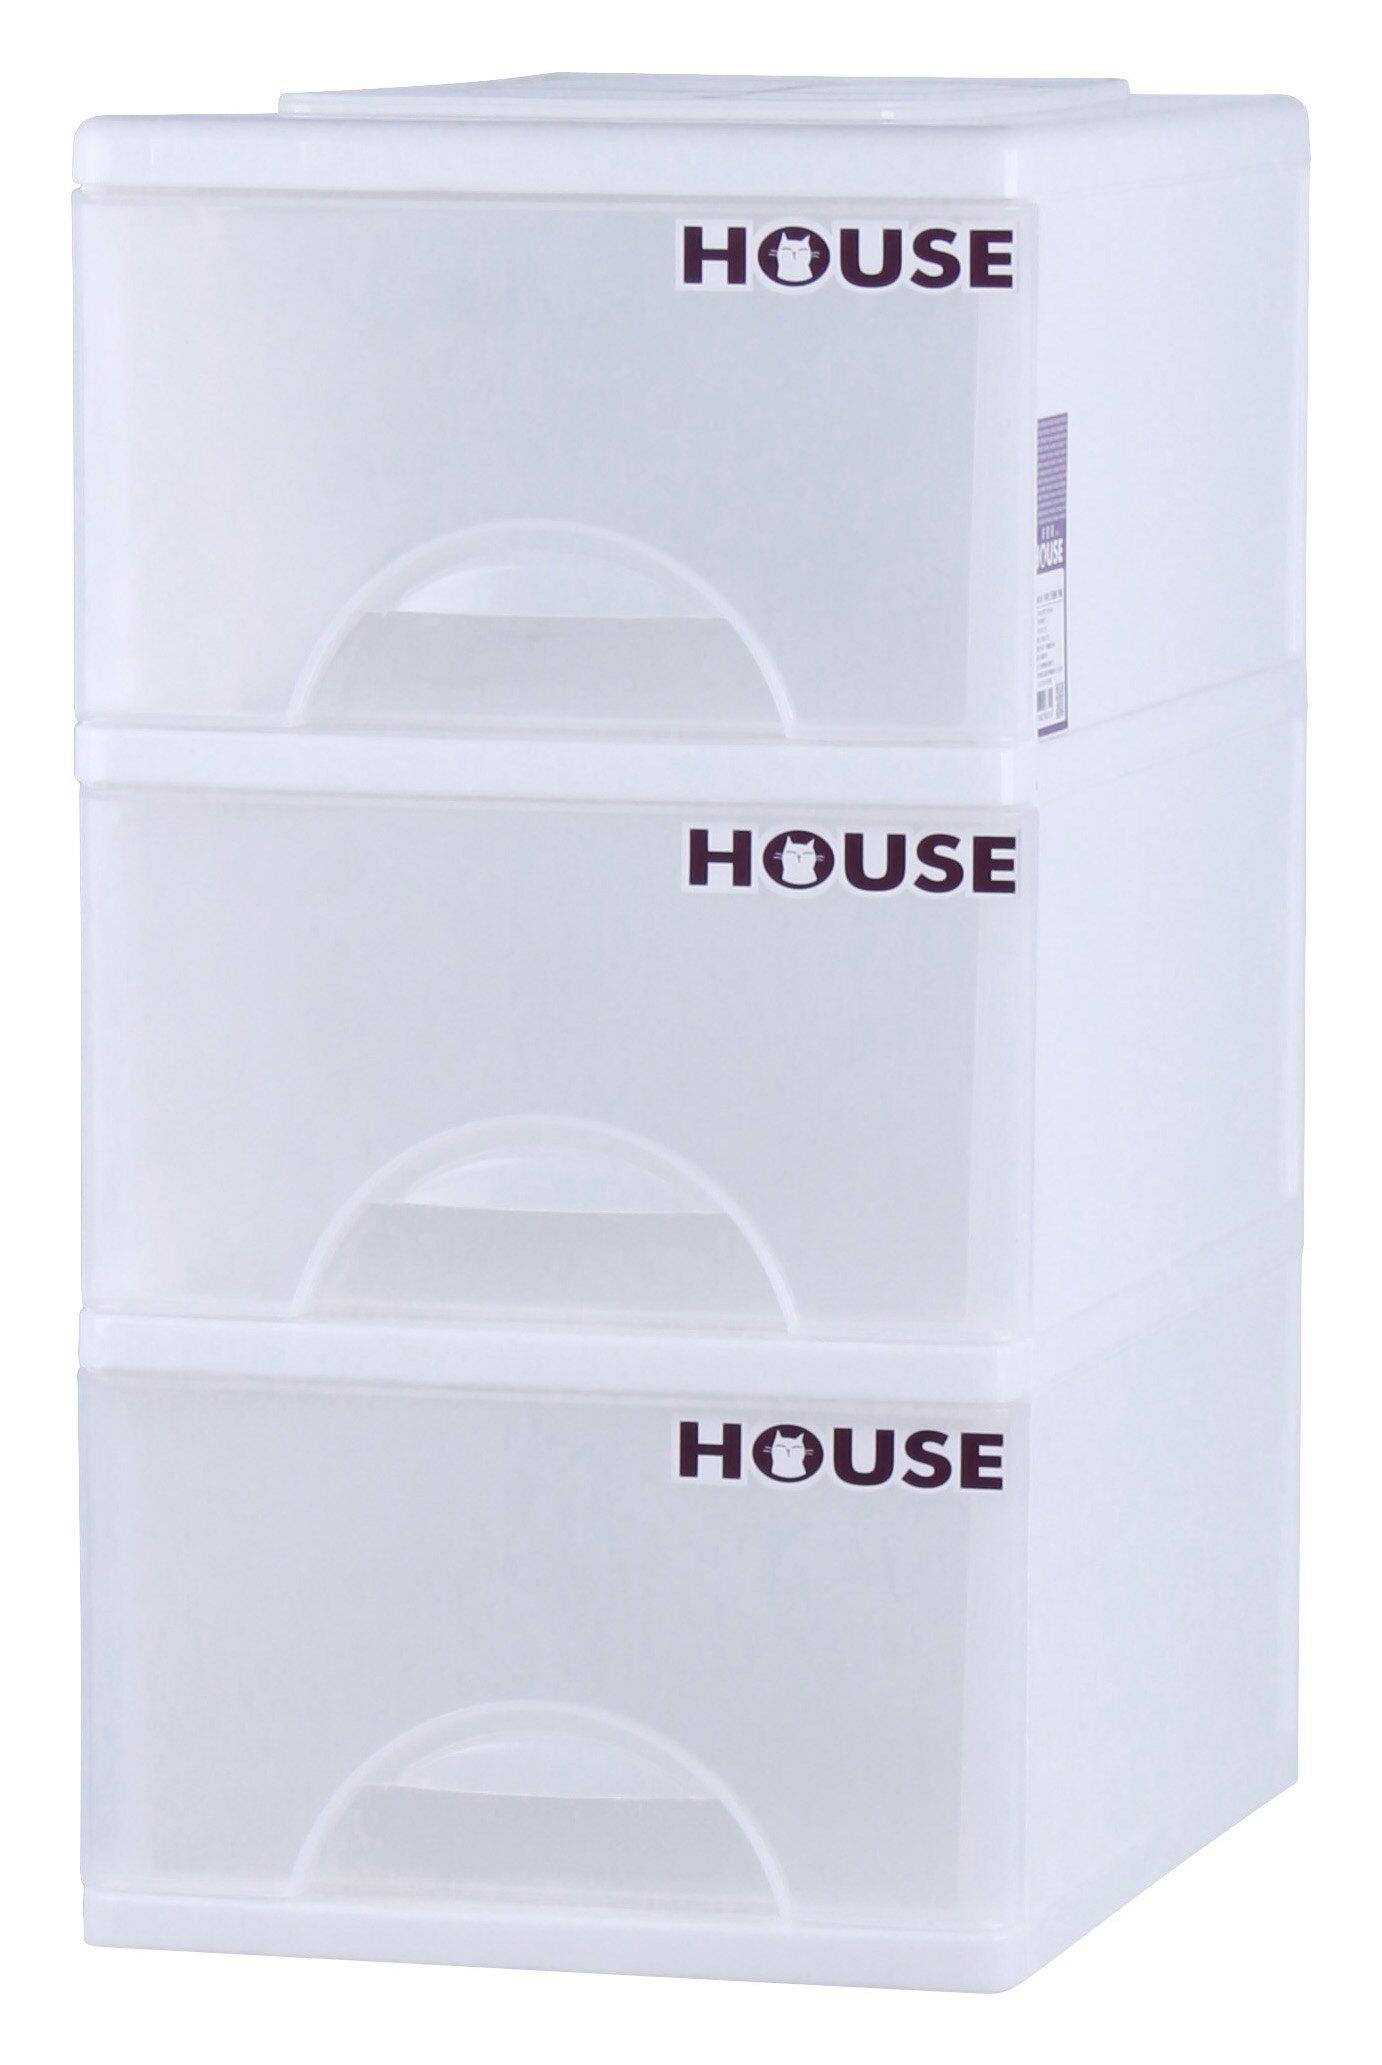 E&J【652046】Mr.box大純白三層收納櫃99L(附輪) 收納箱/整理箱/收納袋/衣櫃/衣櫥